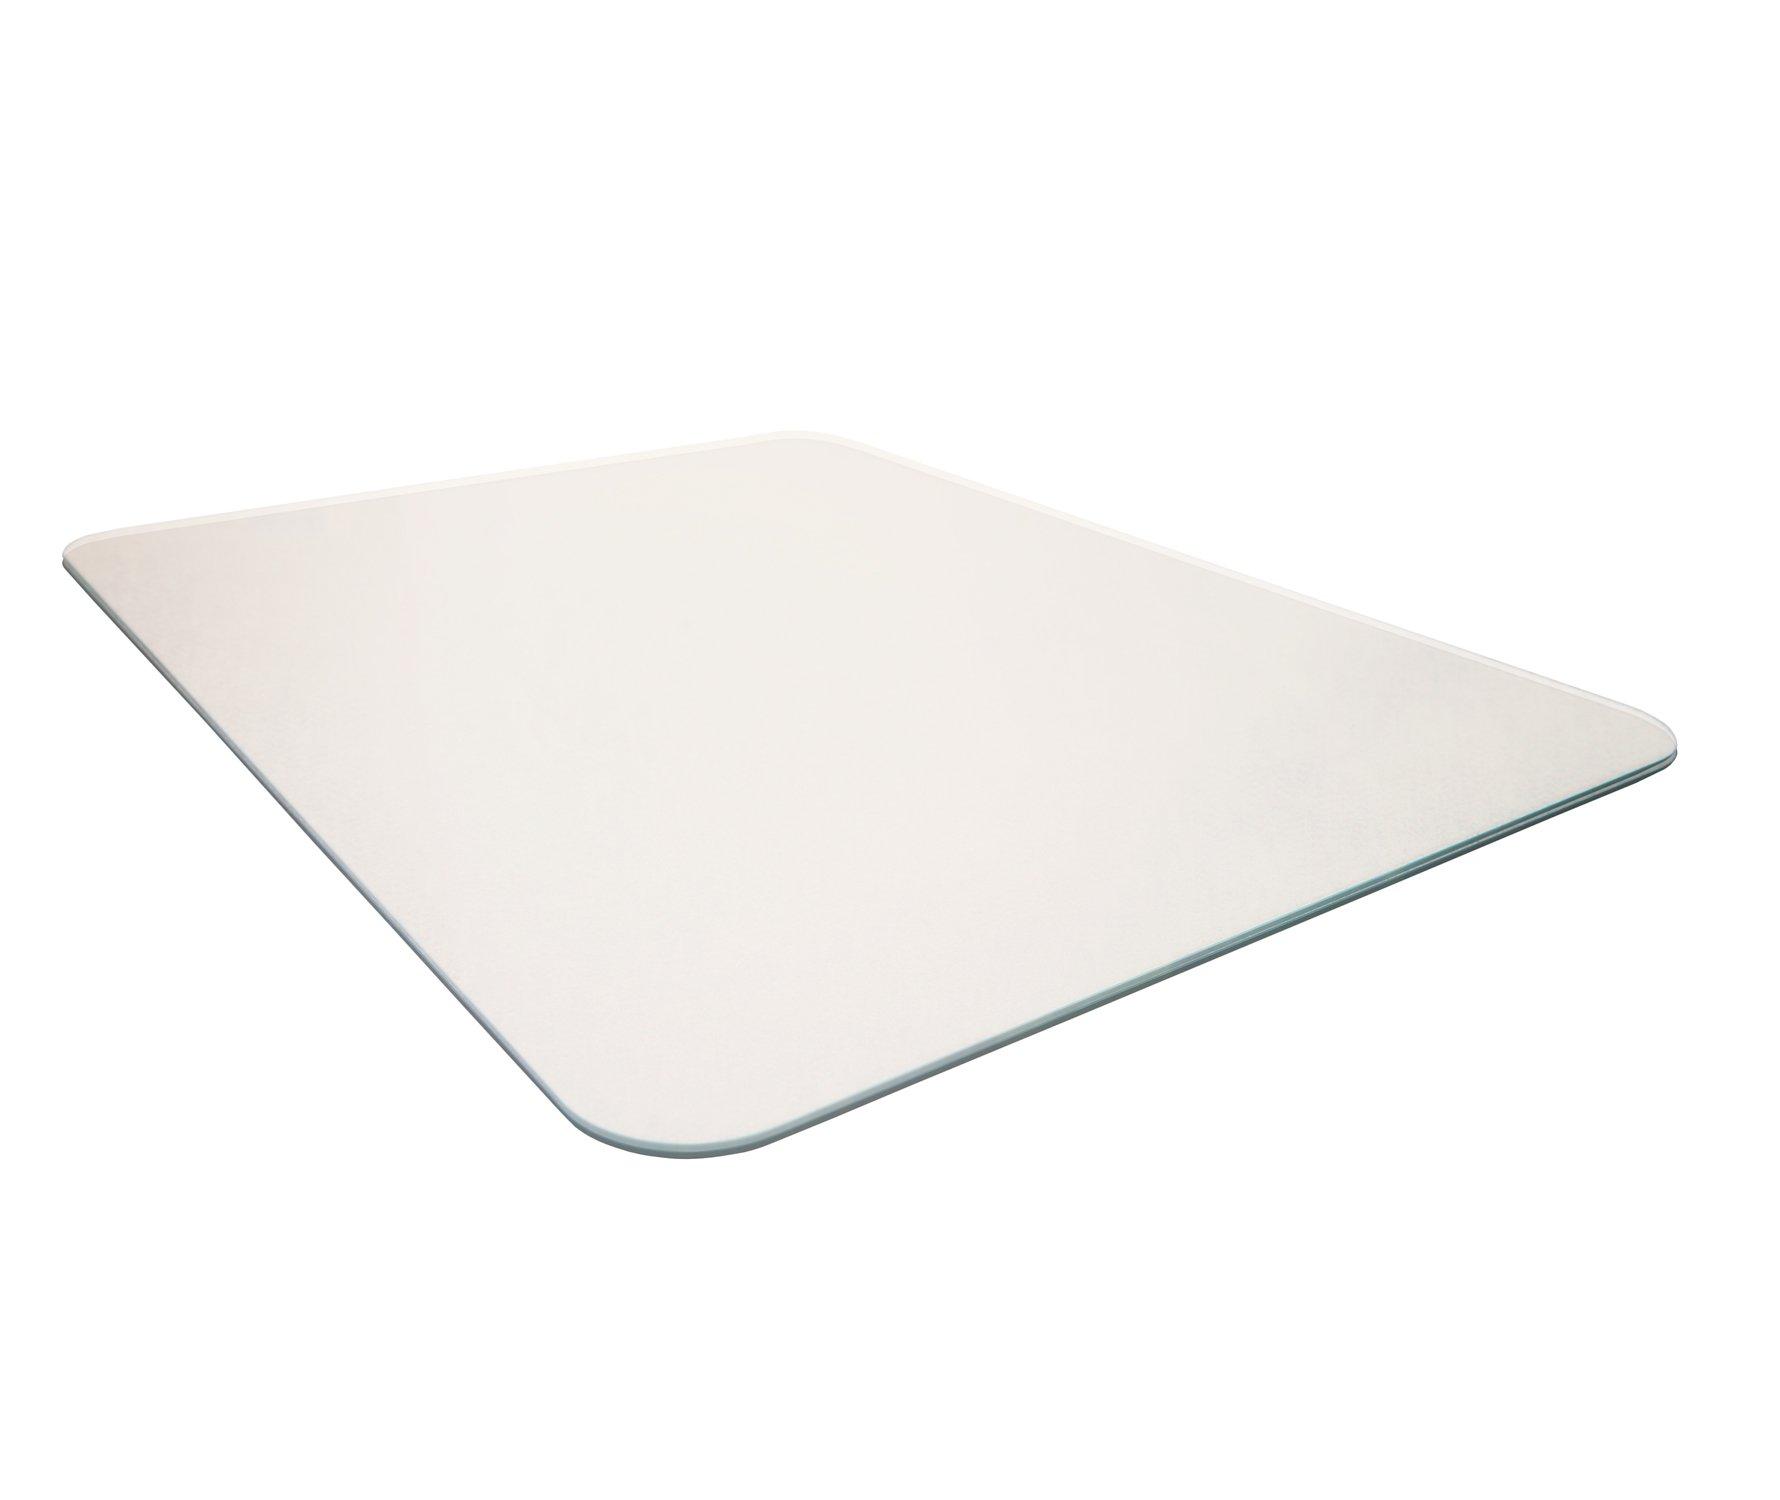 Cleartex Glacier Mat Glass Chair Mat for Hard Floors/All Pile Carpets, 40''x53'', Crystal Clear (FC124053EG)